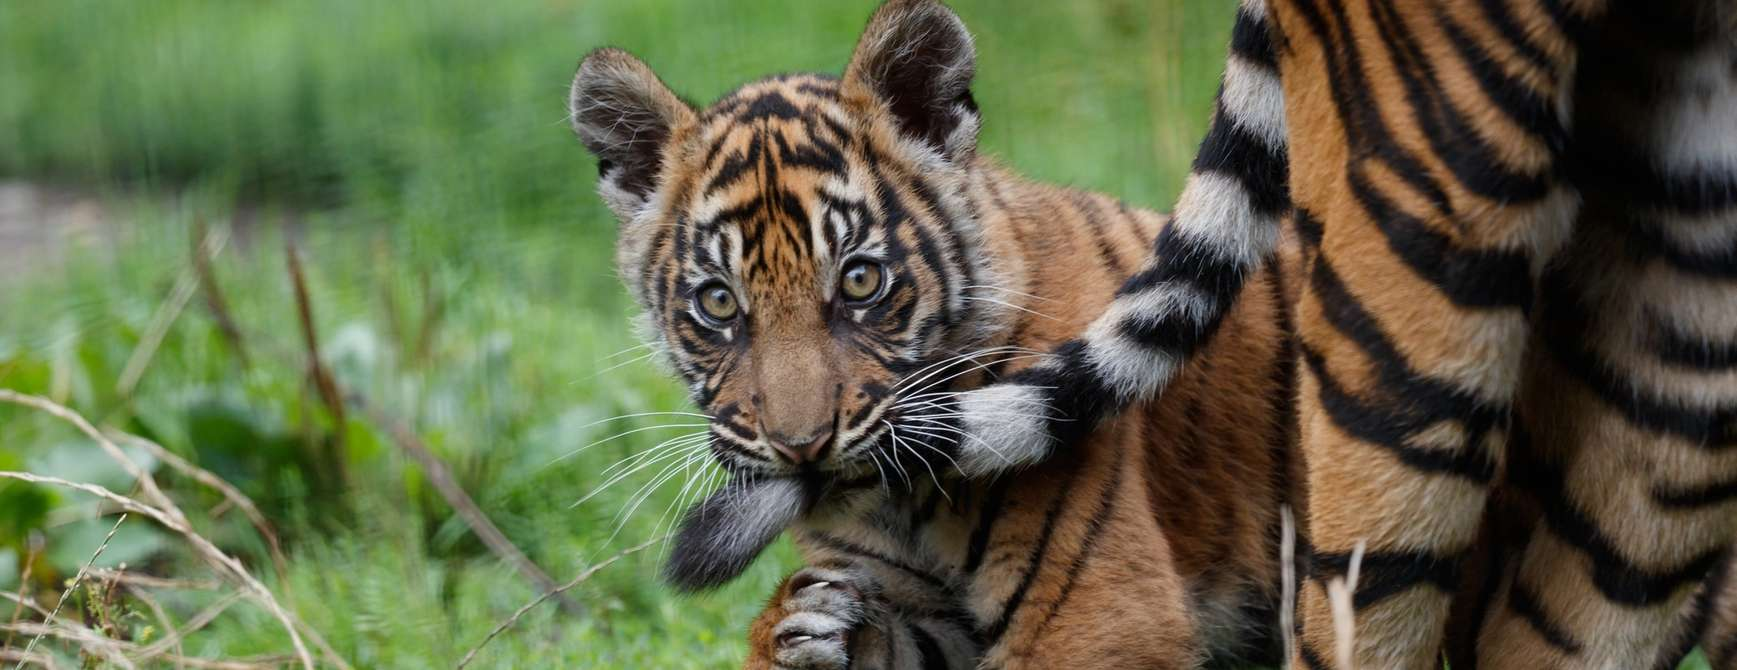 Tigerunge i Aalborg Zoo